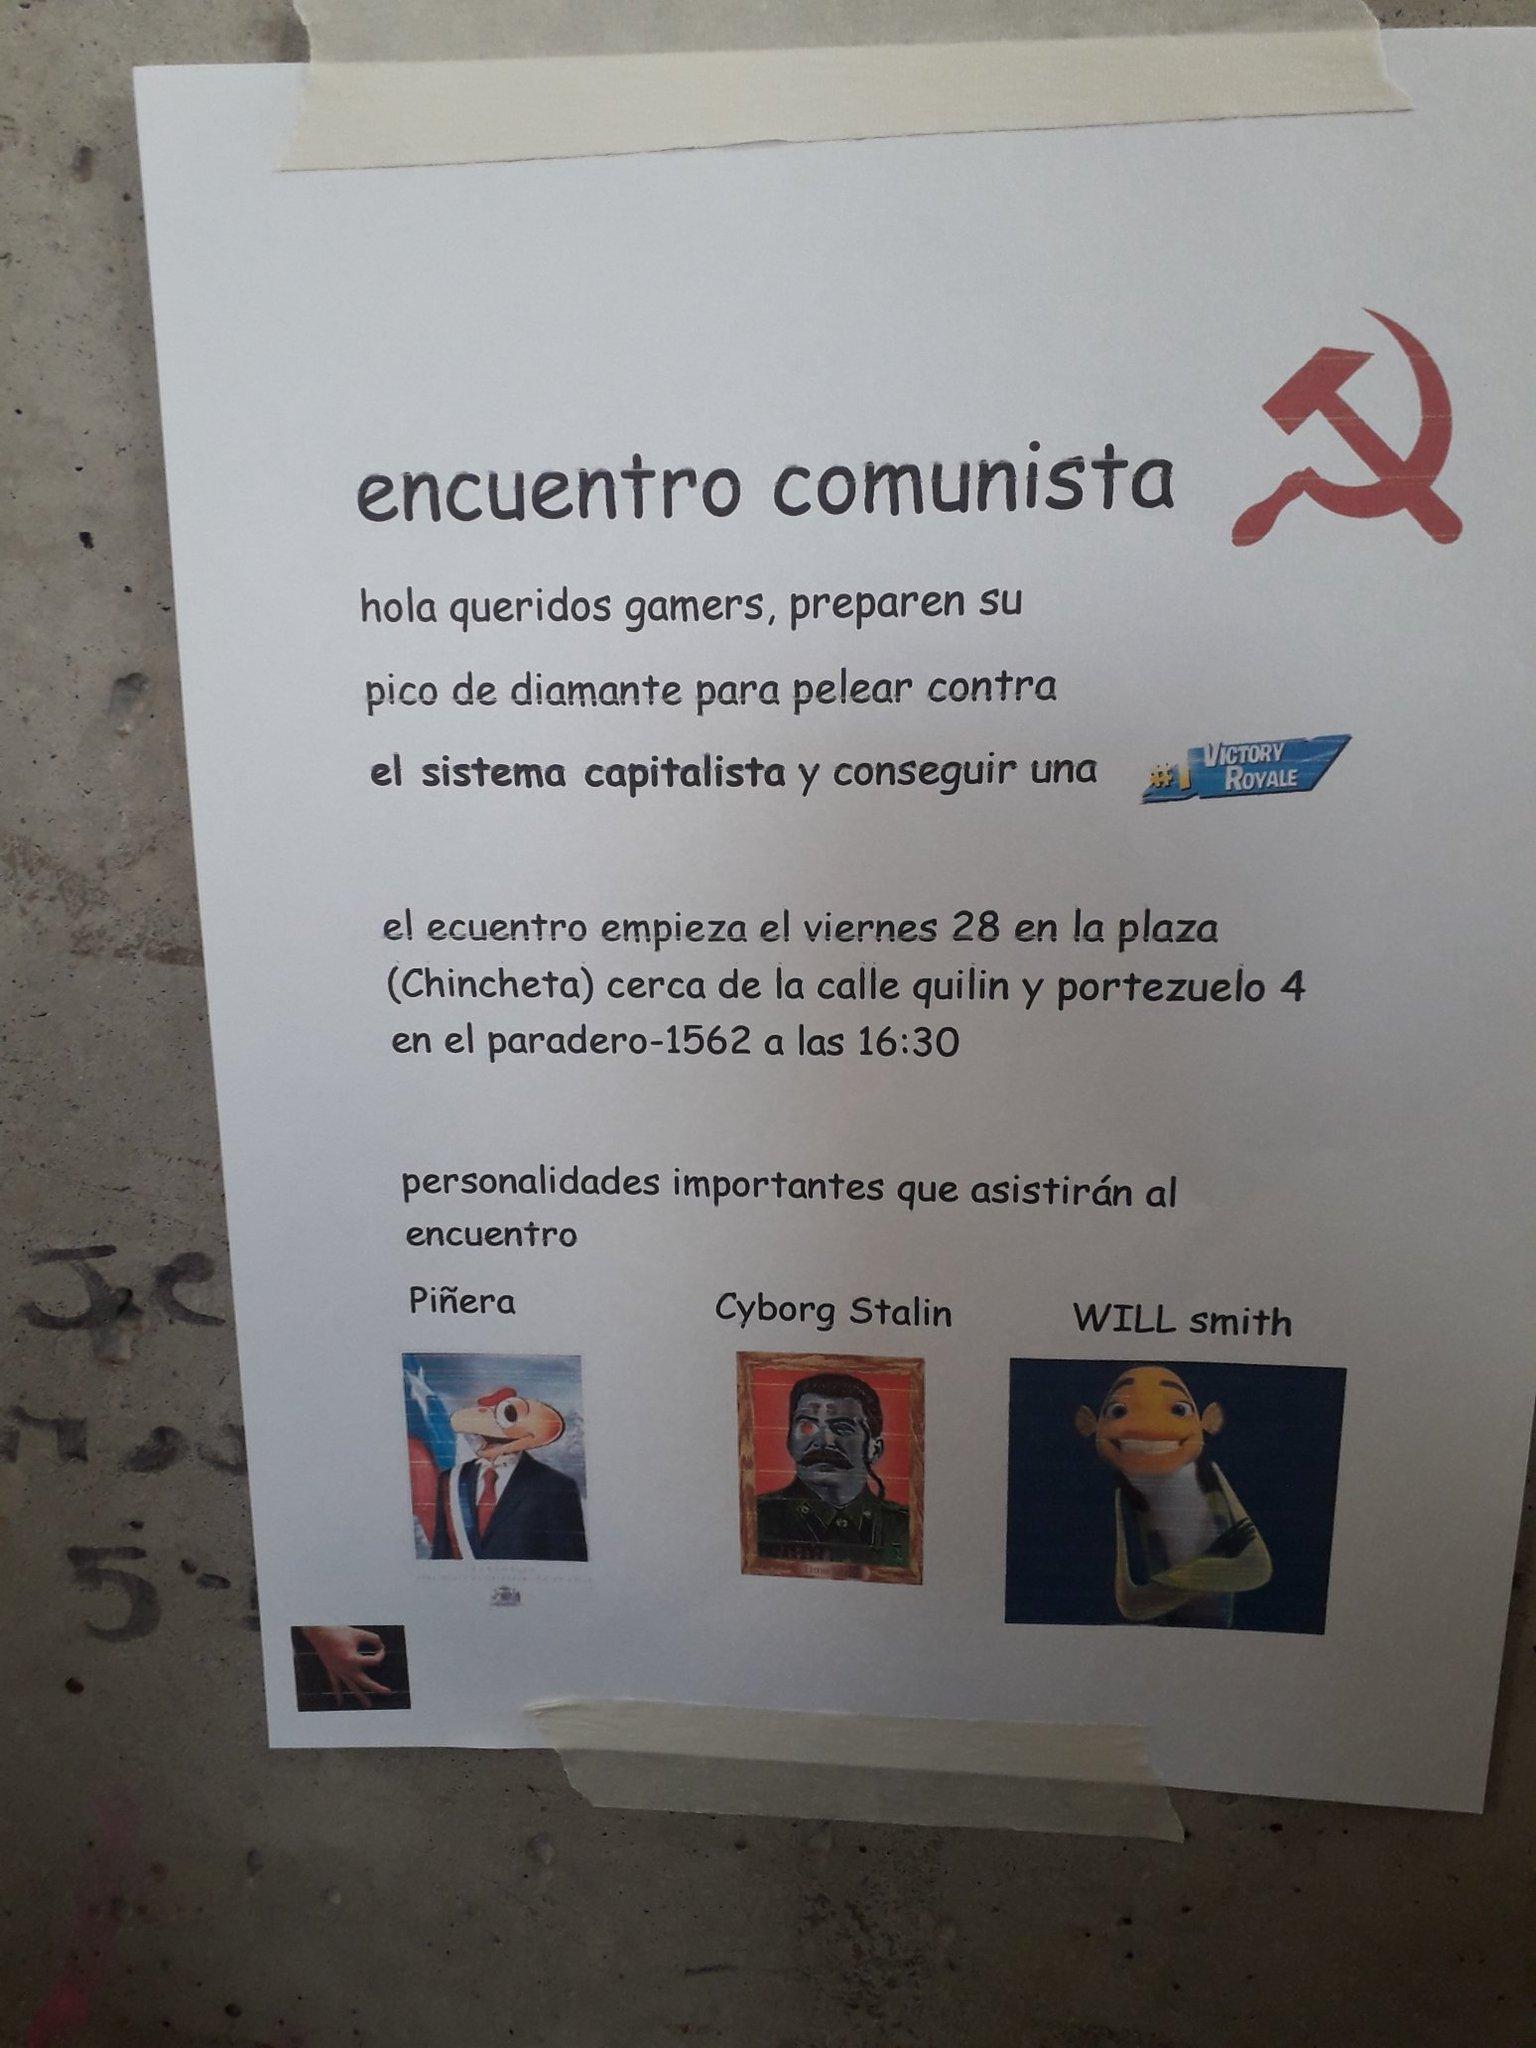 Comunnism - meme